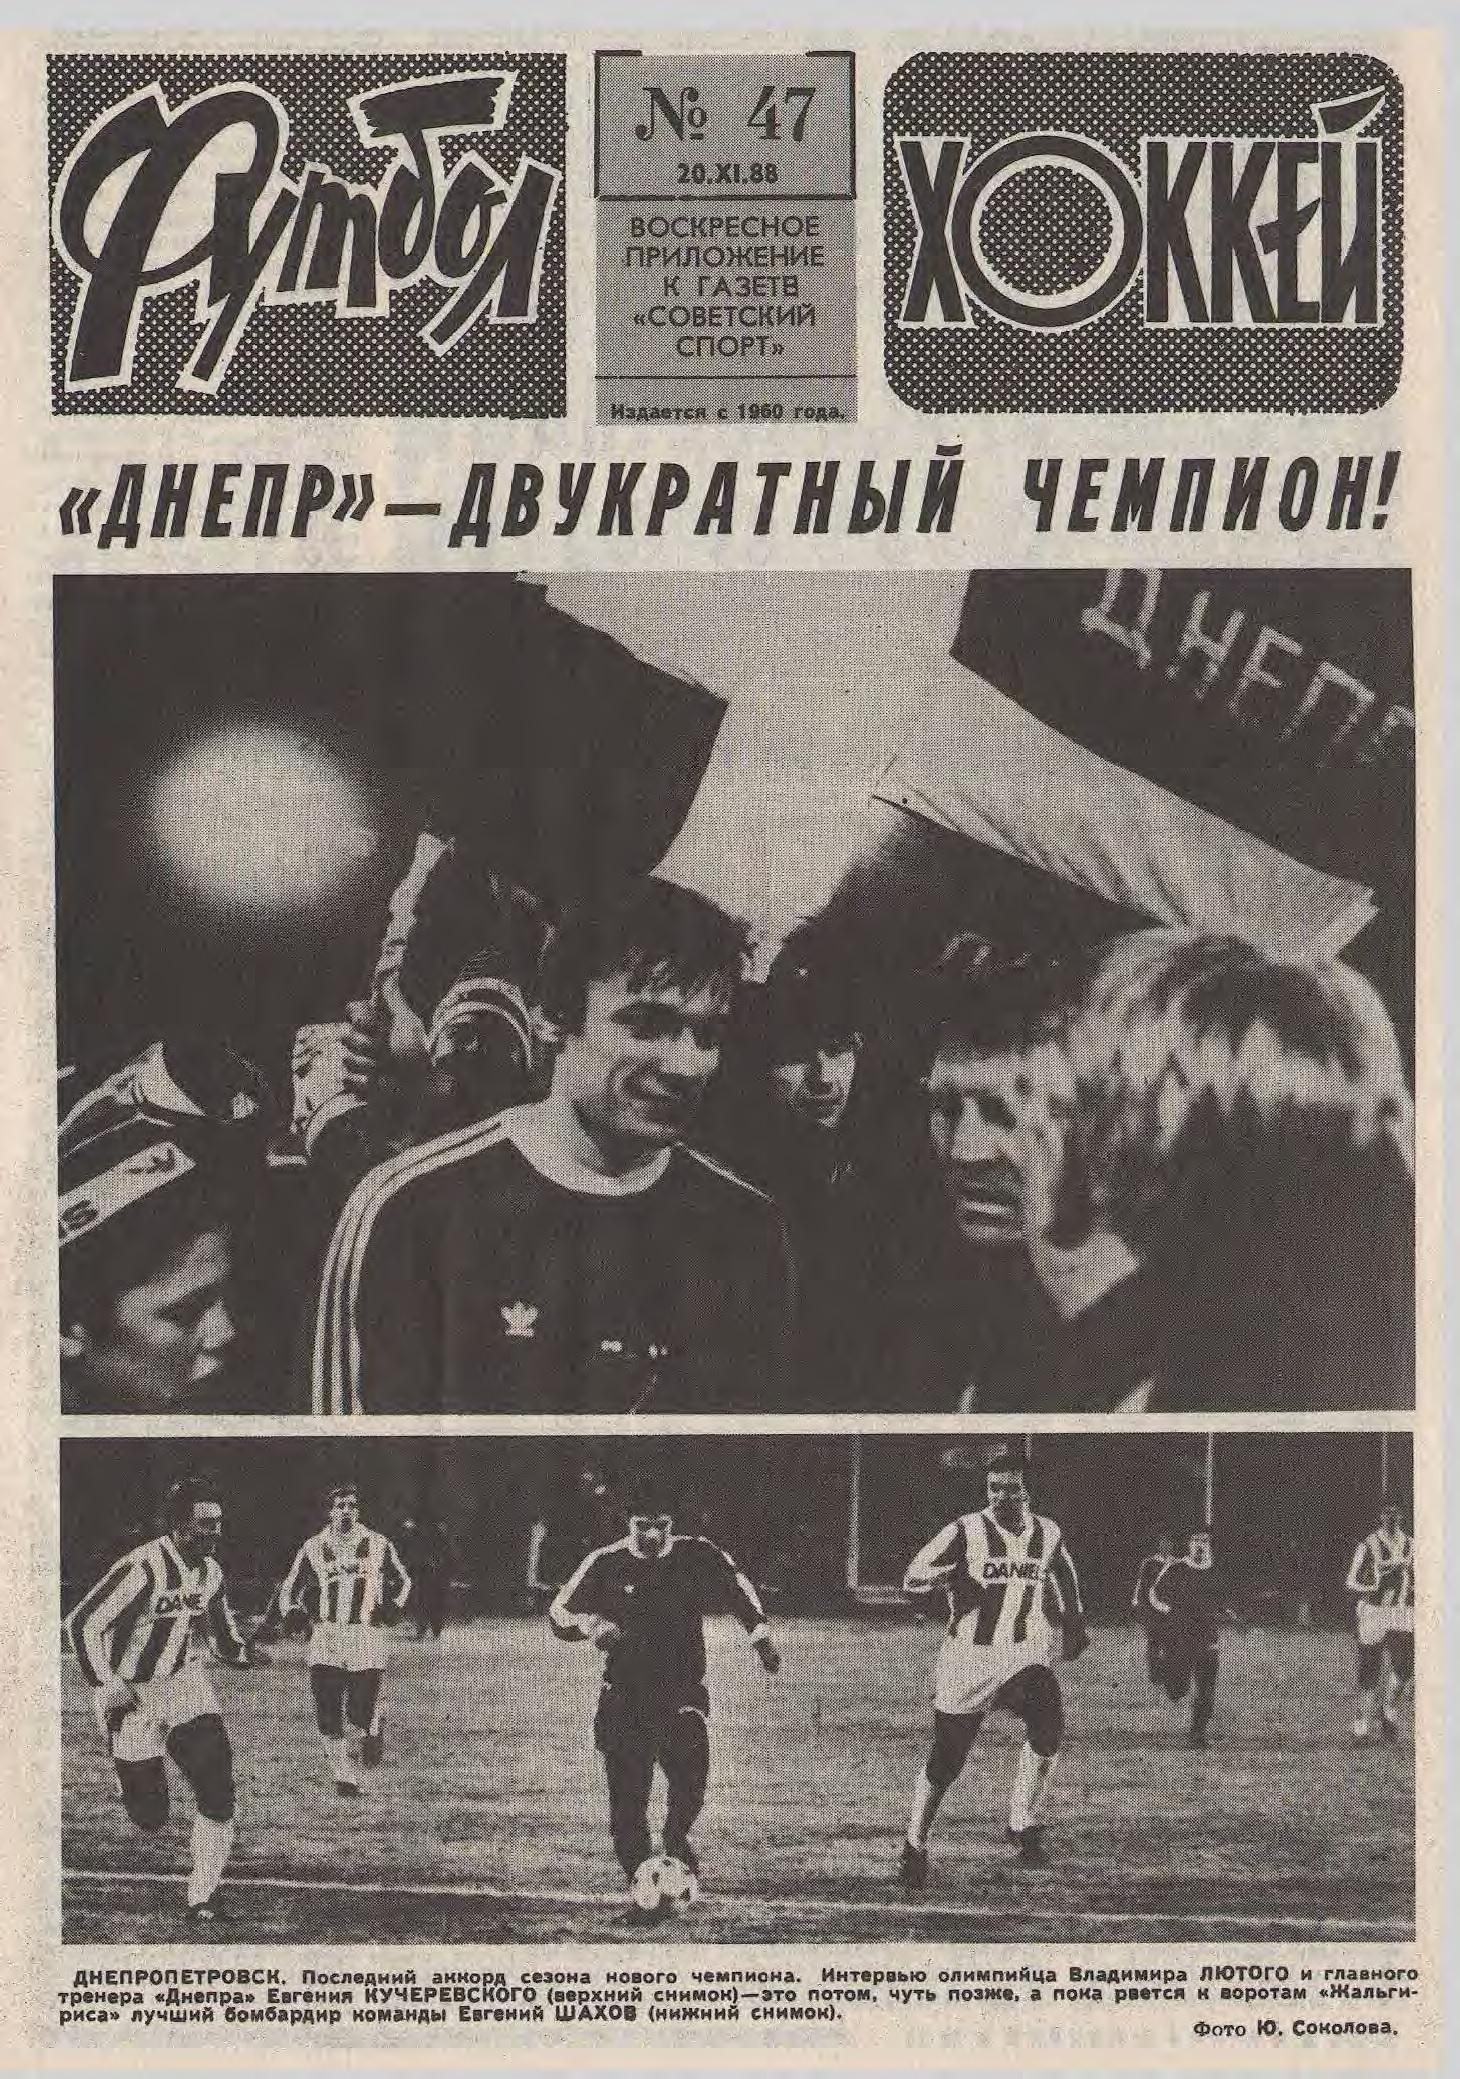 Победа на Олимпиаде, финал Евро, «Днепр» – чемпион. 1988 год в обложках еженедельника «Футбол»